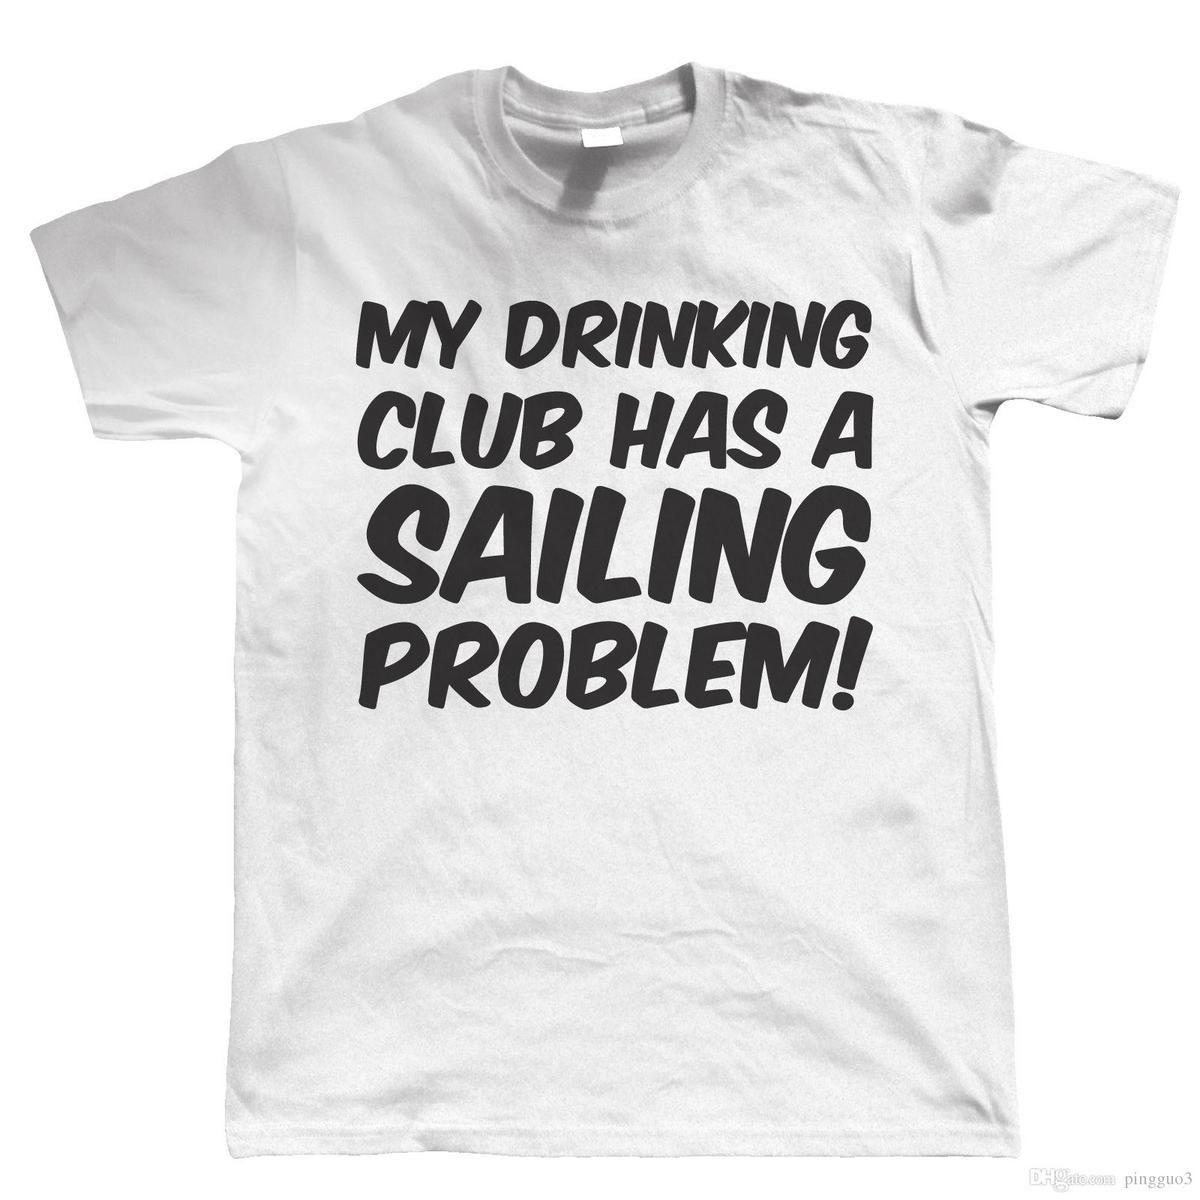 5a5e701c My Drinking Club Has A Sailinger Problem, Mens Funny Sailinger T Shirt  Cheap Price 100 % Cotton T Shirts Basic Models Top Tee Online Shop T Shirt  Shirts ...